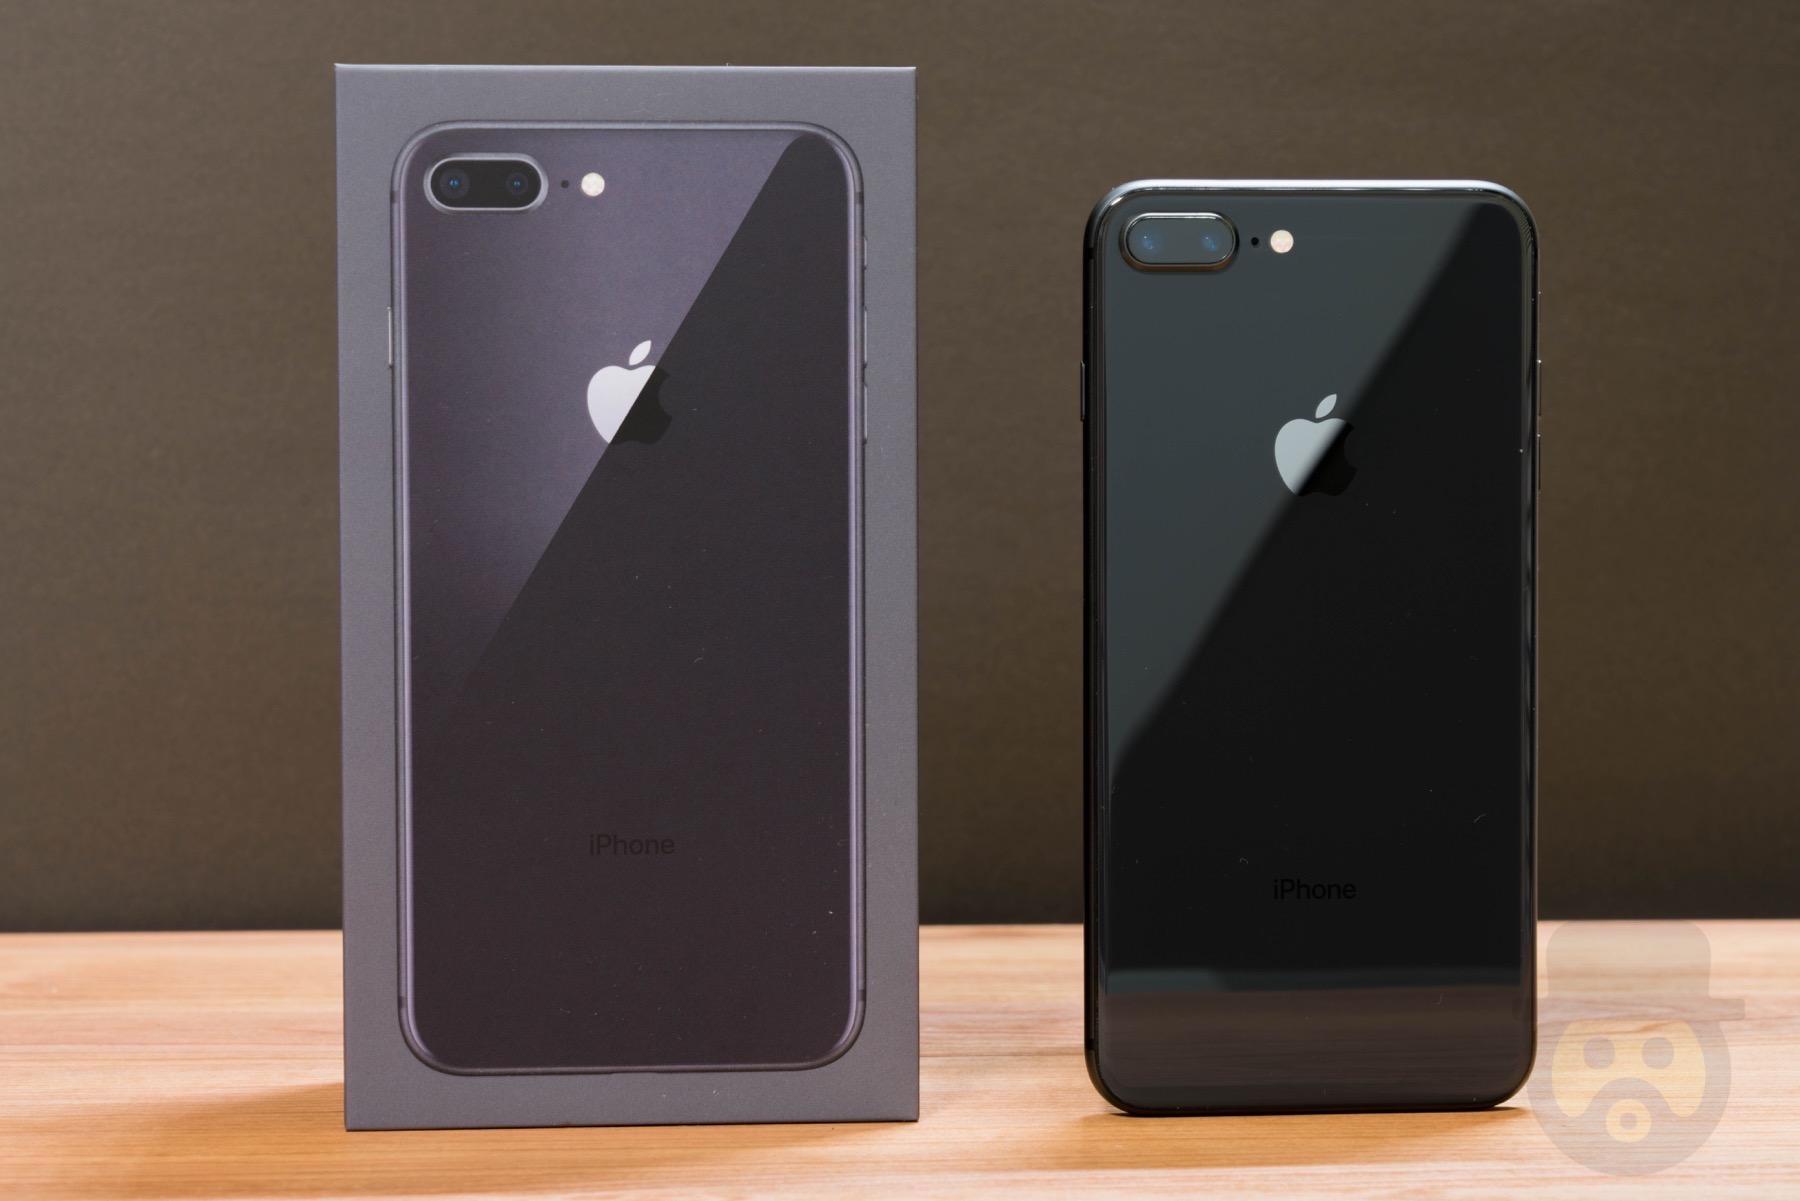 iPhone 8 Plus 開封レビュー!輝きを放つ背面パネル外観はまるで芸術品